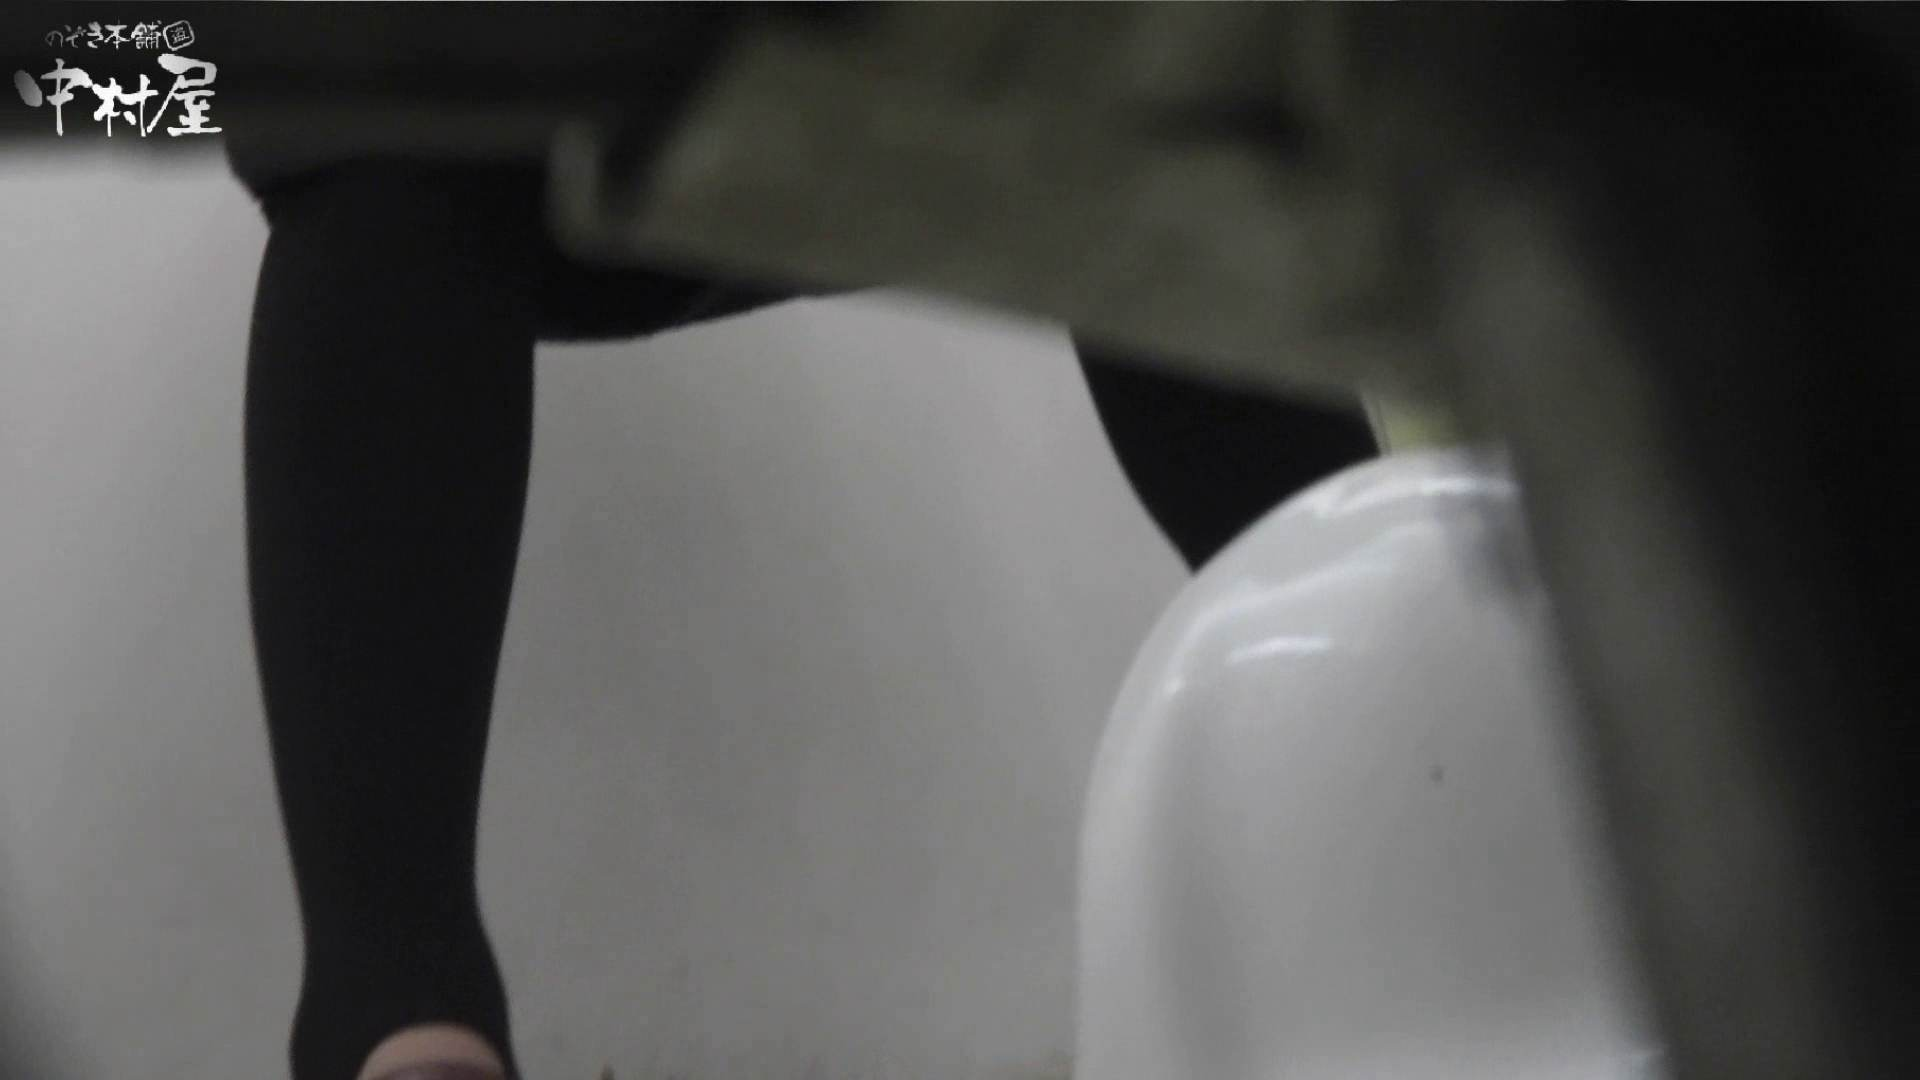 vol.56 命がけ潜伏洗面所! 強力放水清楚ねぃちゃん プライベート ワレメ無修正動画無料 74枚 19